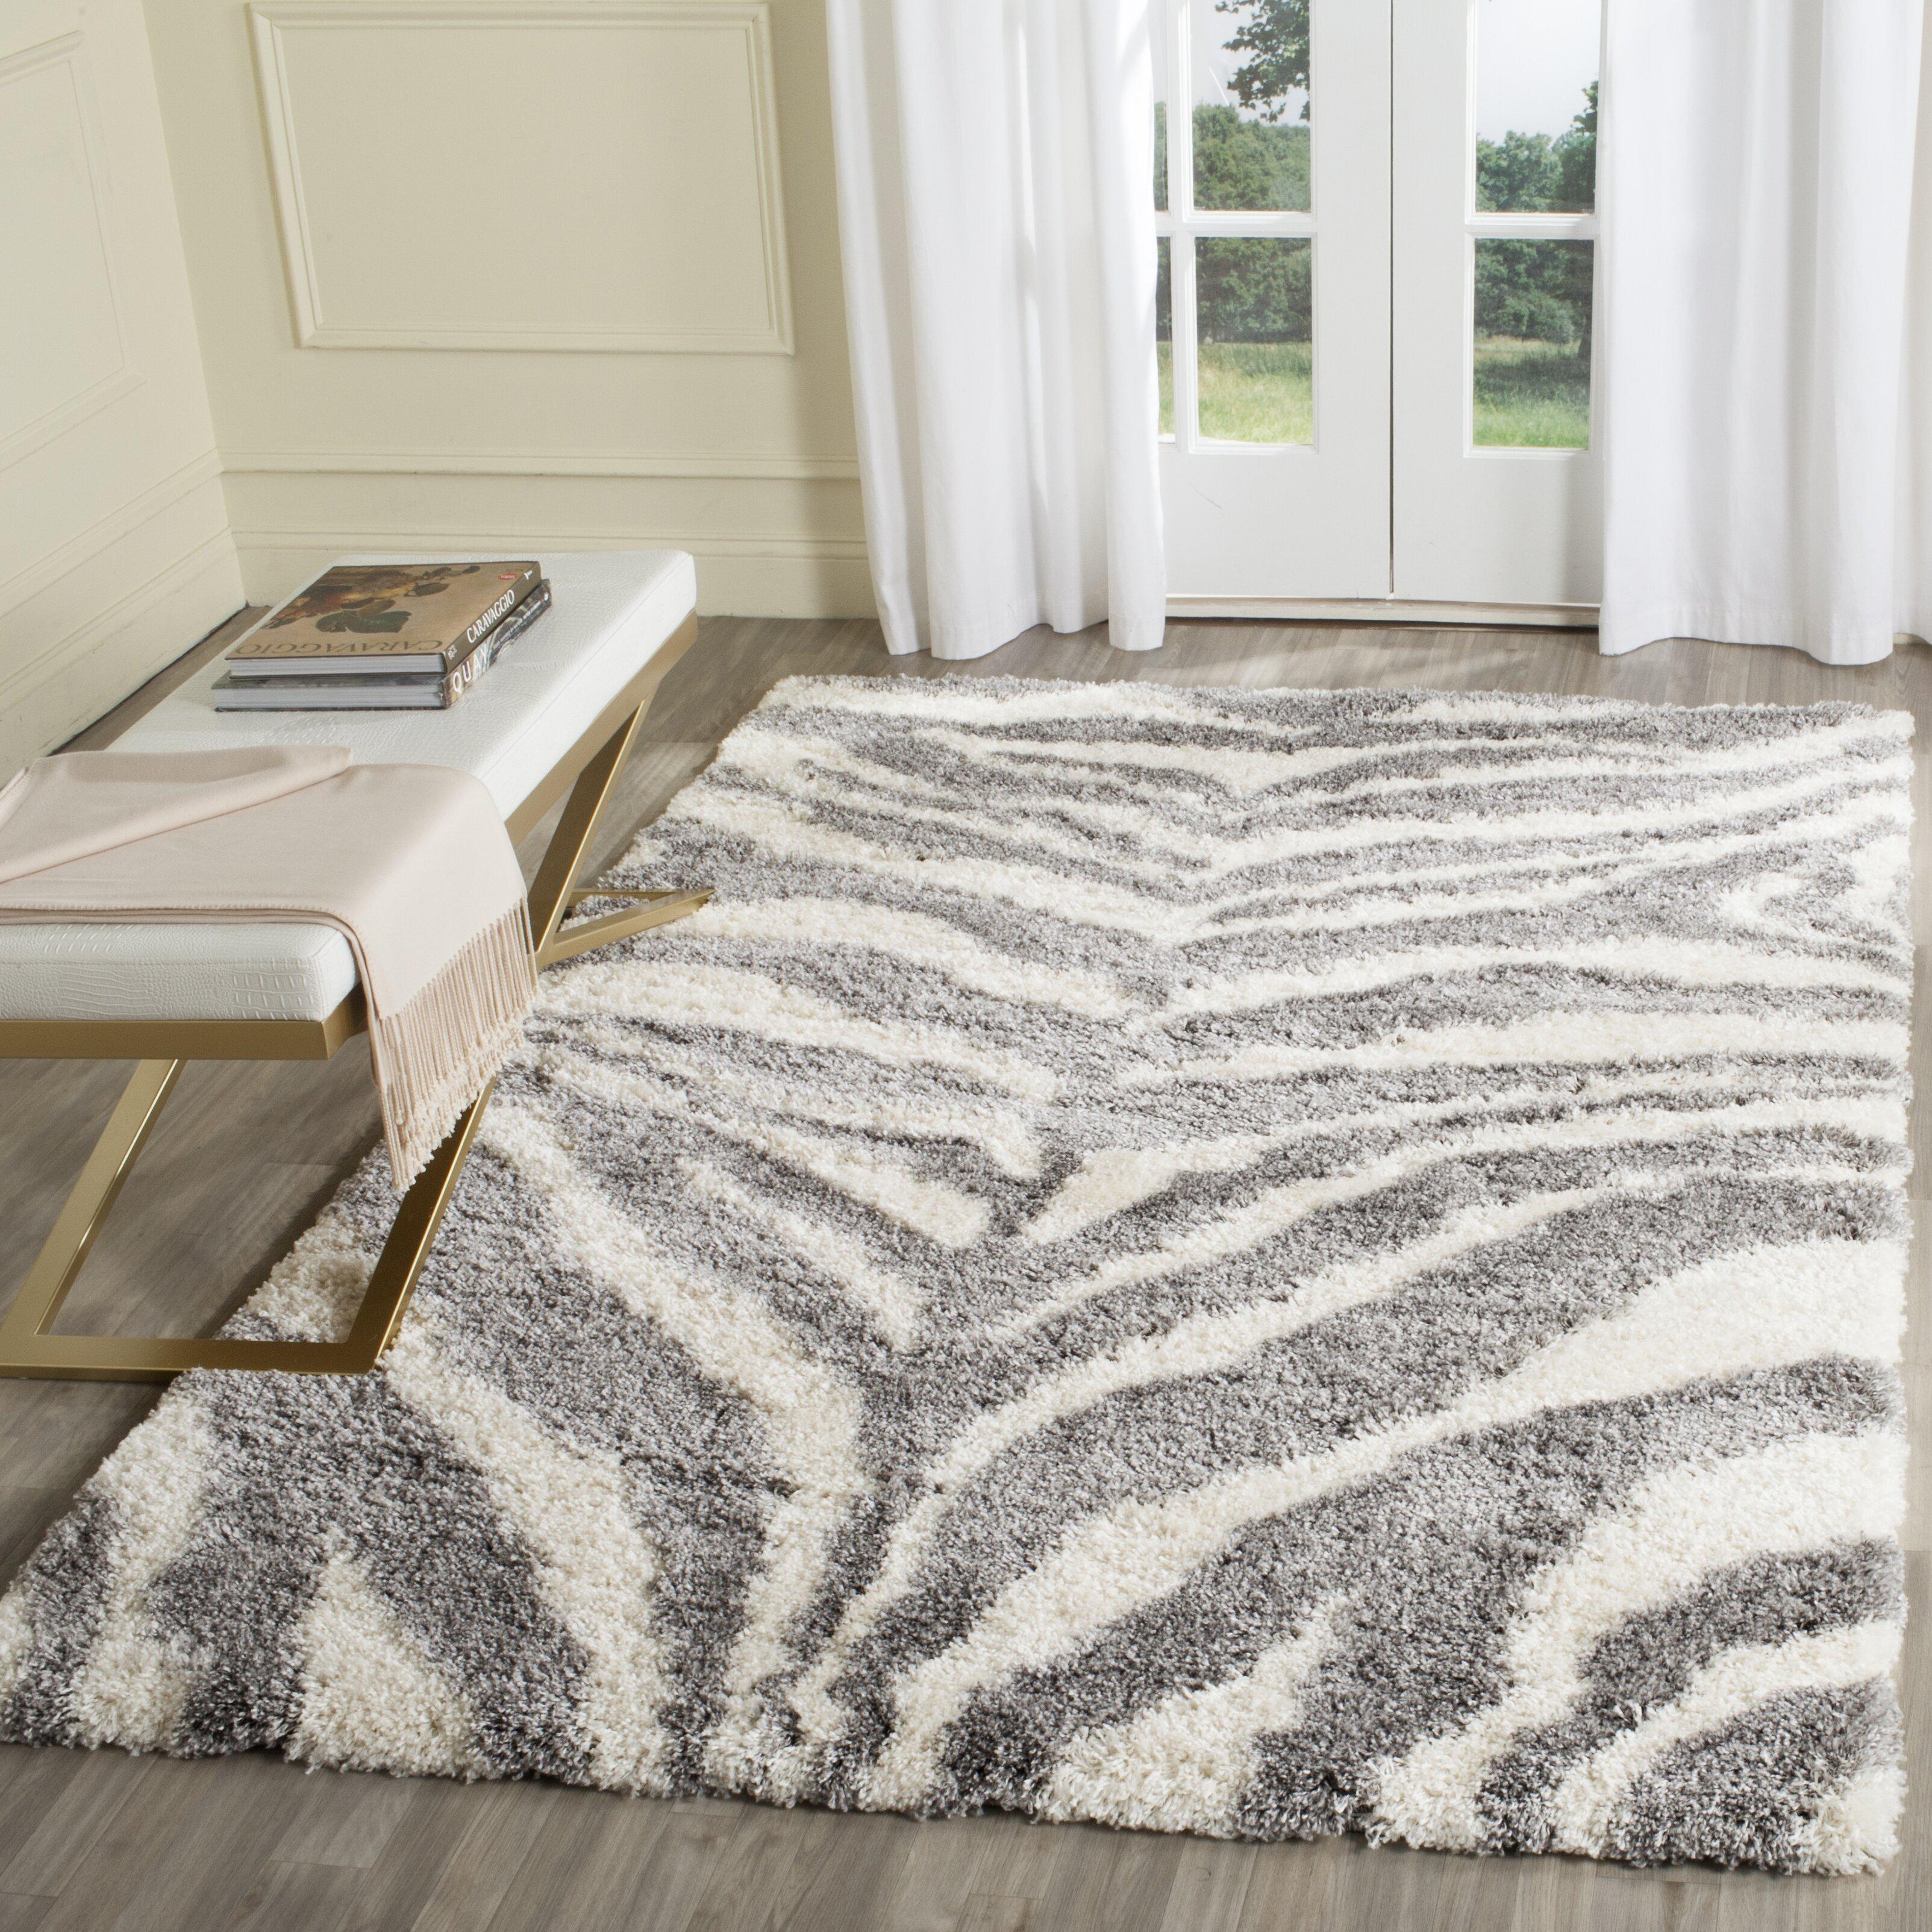 Animal Print Rug Wayfair: House Of Hampton Laplaigne Shag Ivory/Gray Area Rug